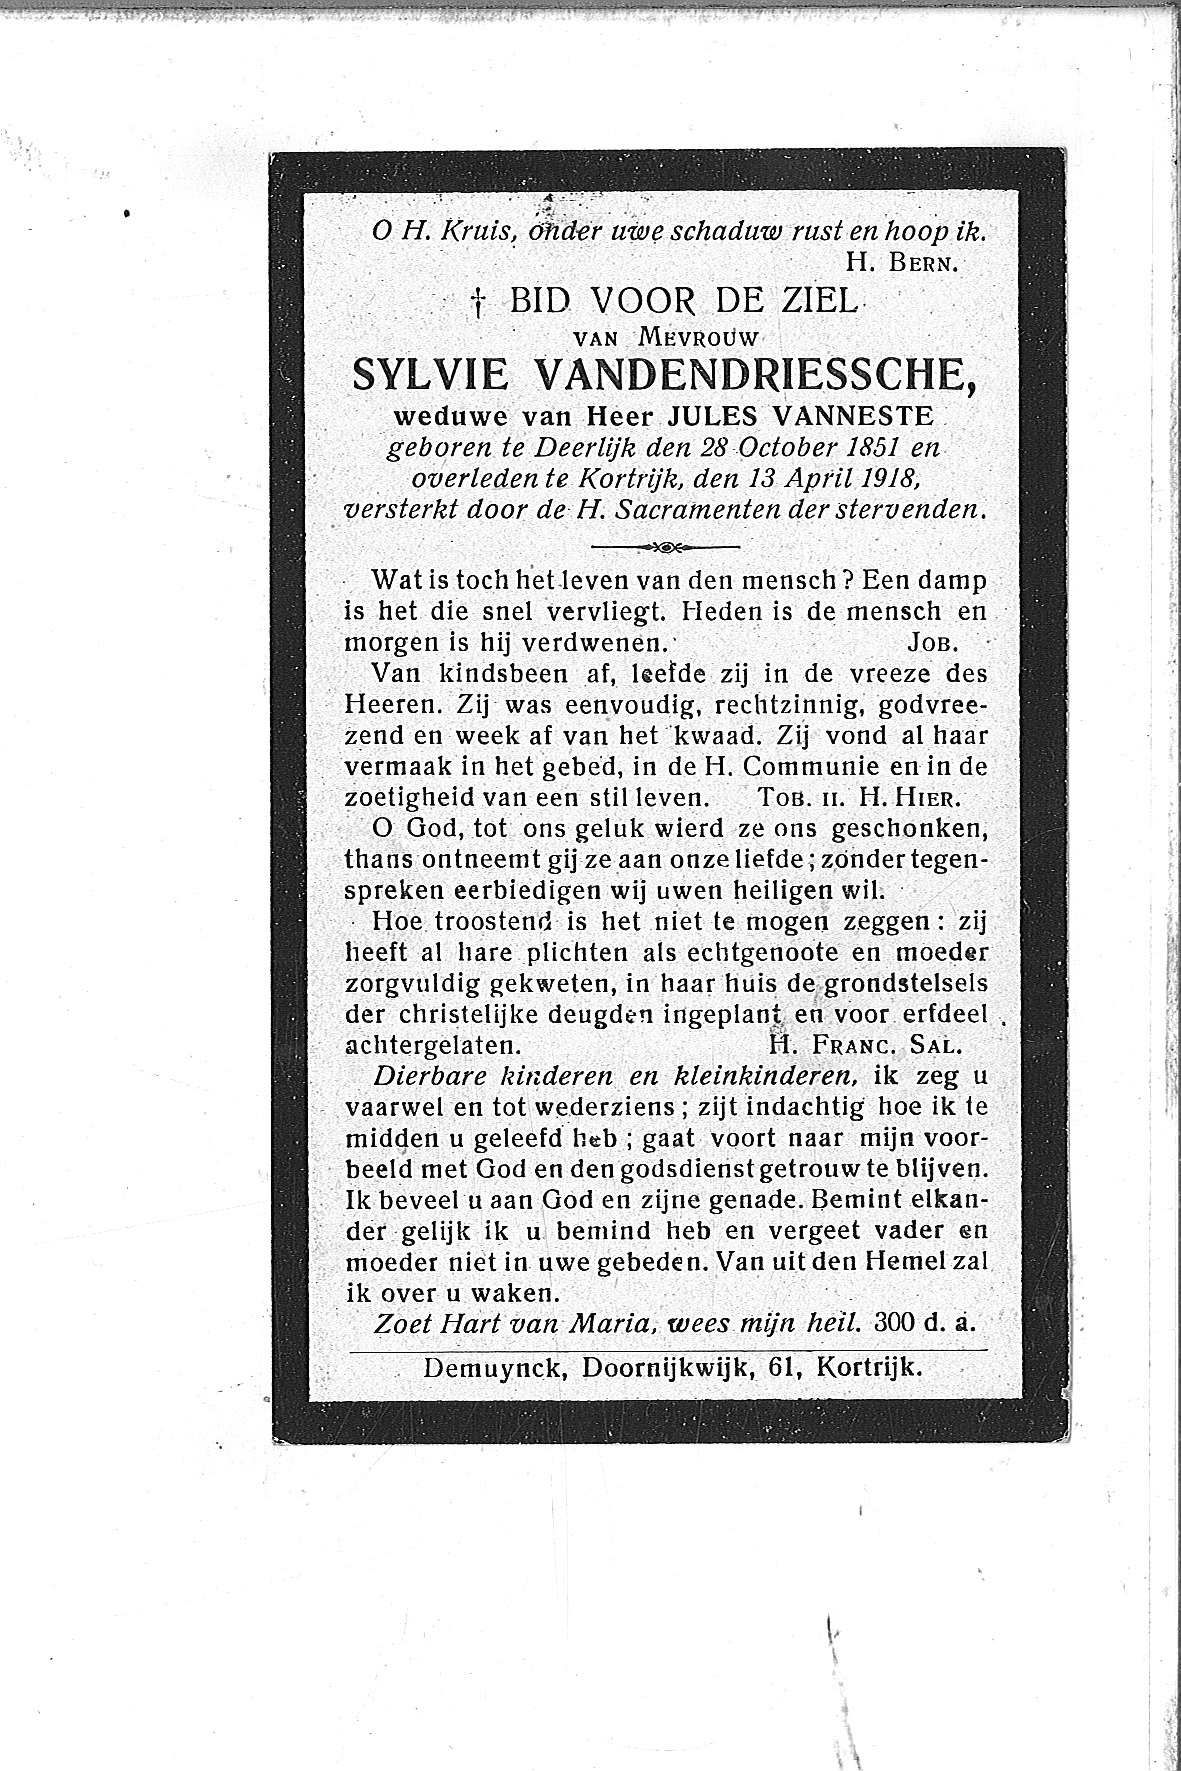 Sylvie(1918)20140704154757_00107.jpg